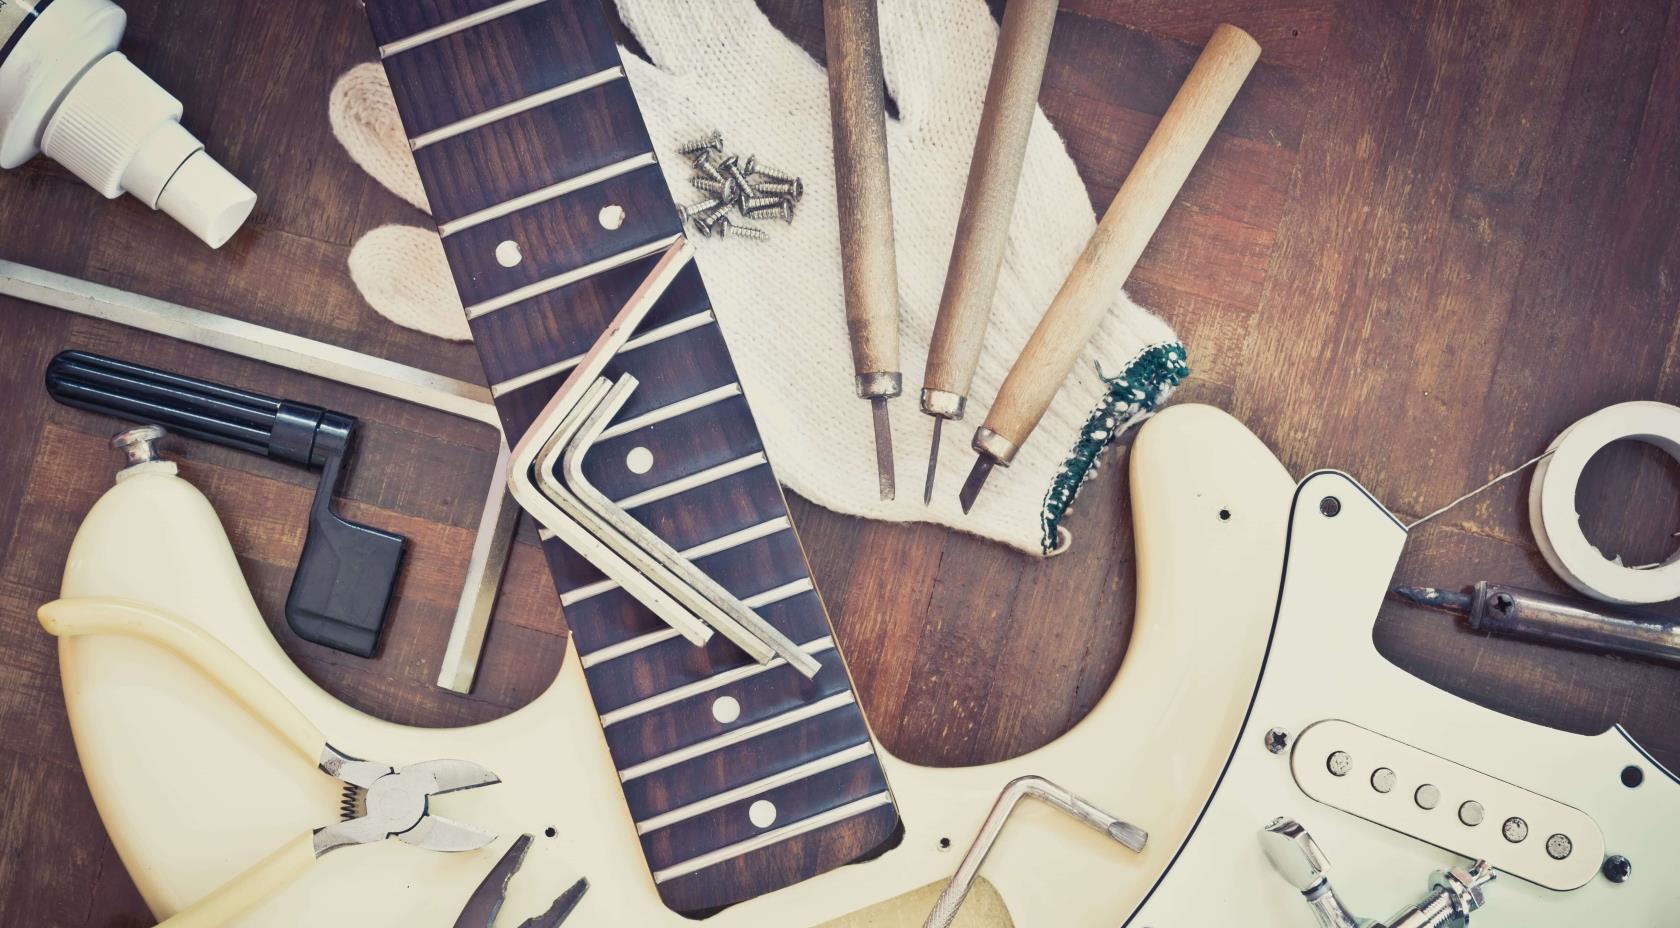 Accessori musicali